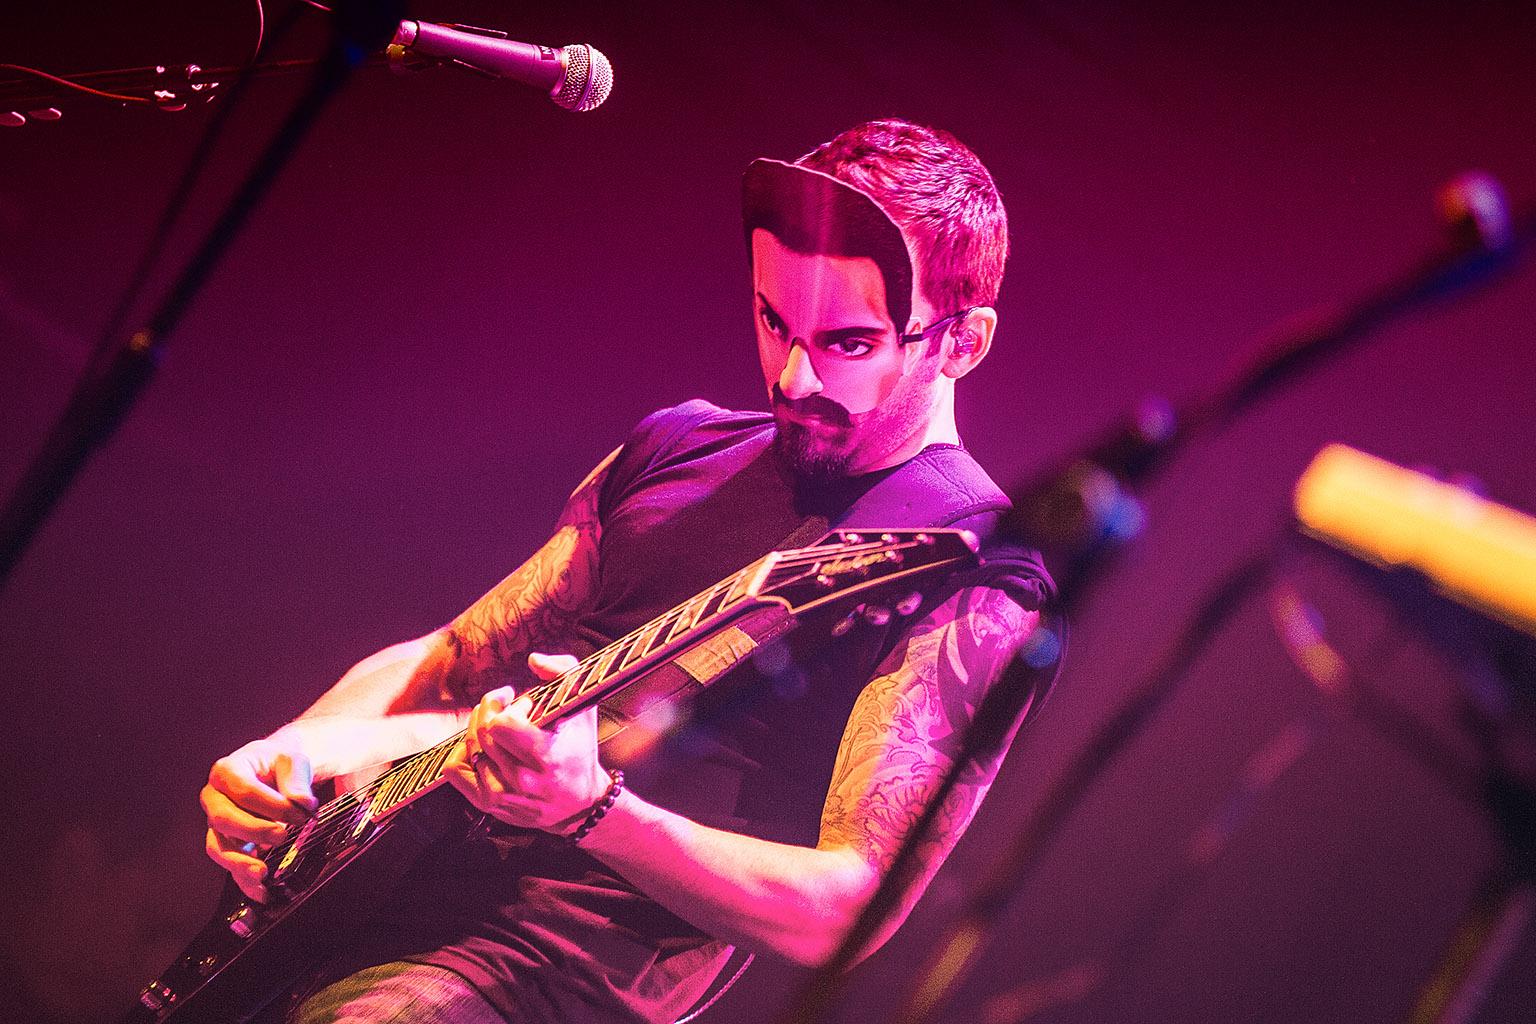 Serj Tankian, Paradiso, Amsterdam The Netherlands 13-10-2012